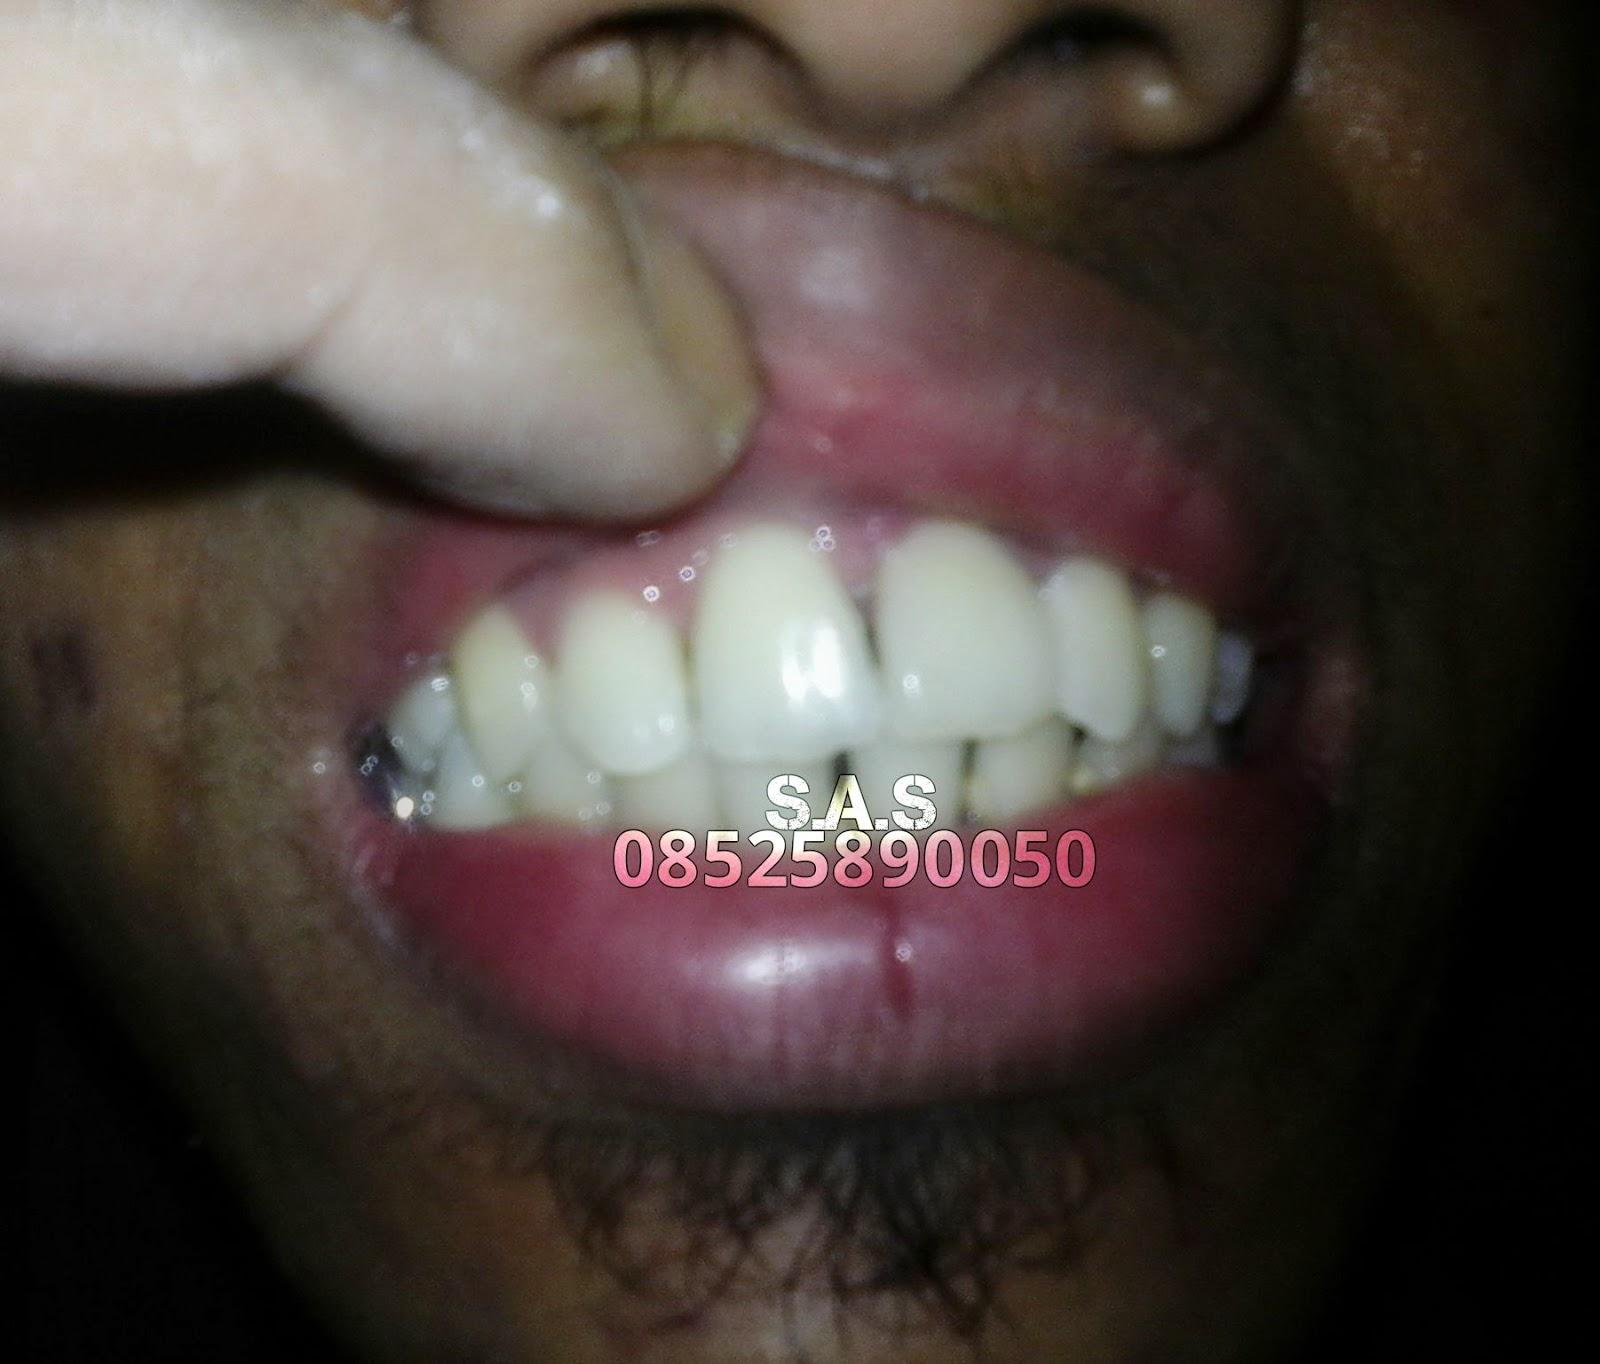 S A S Ahli Gigi Kota Pati Jateng Kota Jember Jatim Foto Hasil